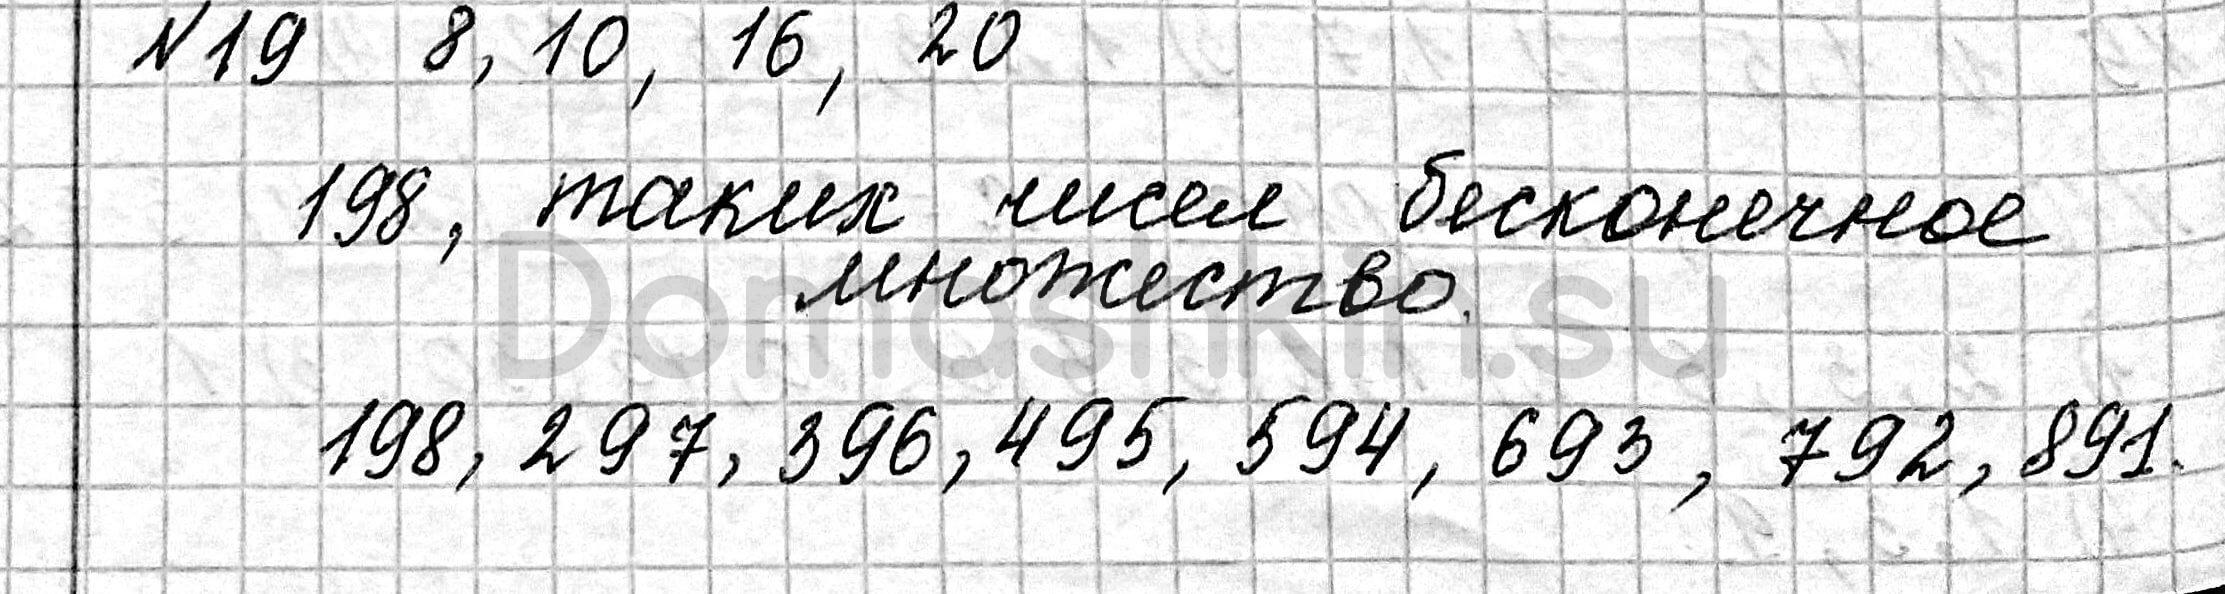 Математика 6 класс учебник Мерзляк номер 19 решение